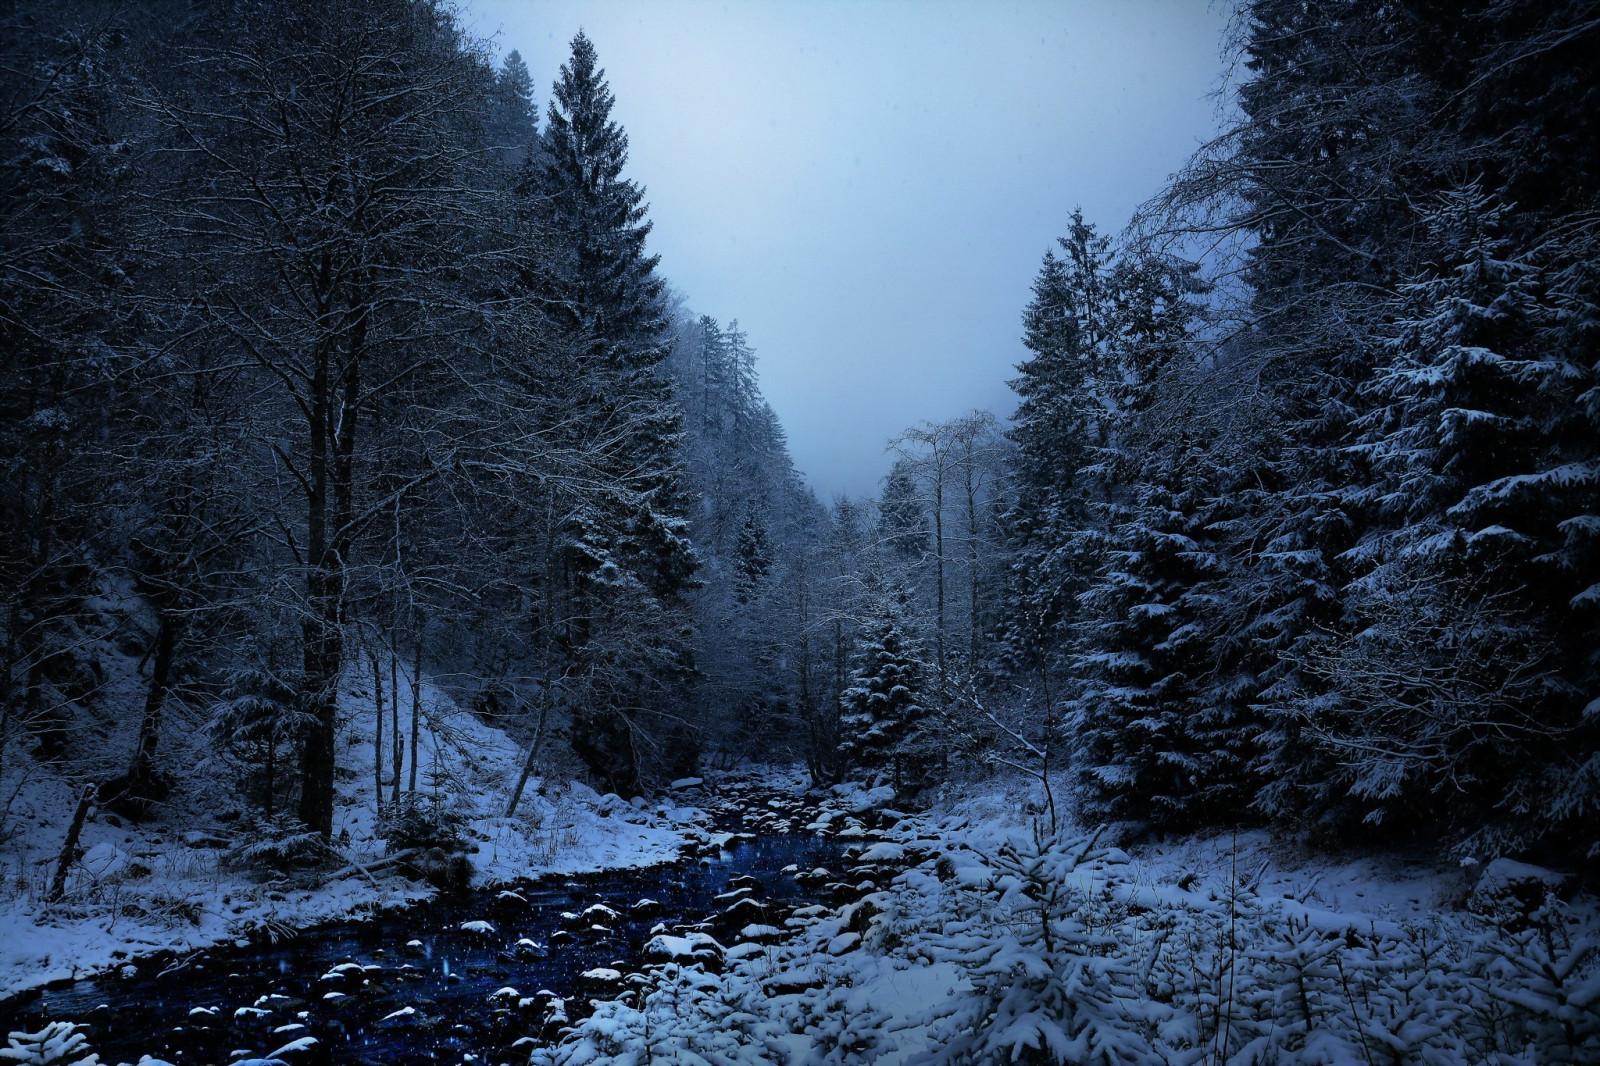 фото лес зима полночь борисовна даёт